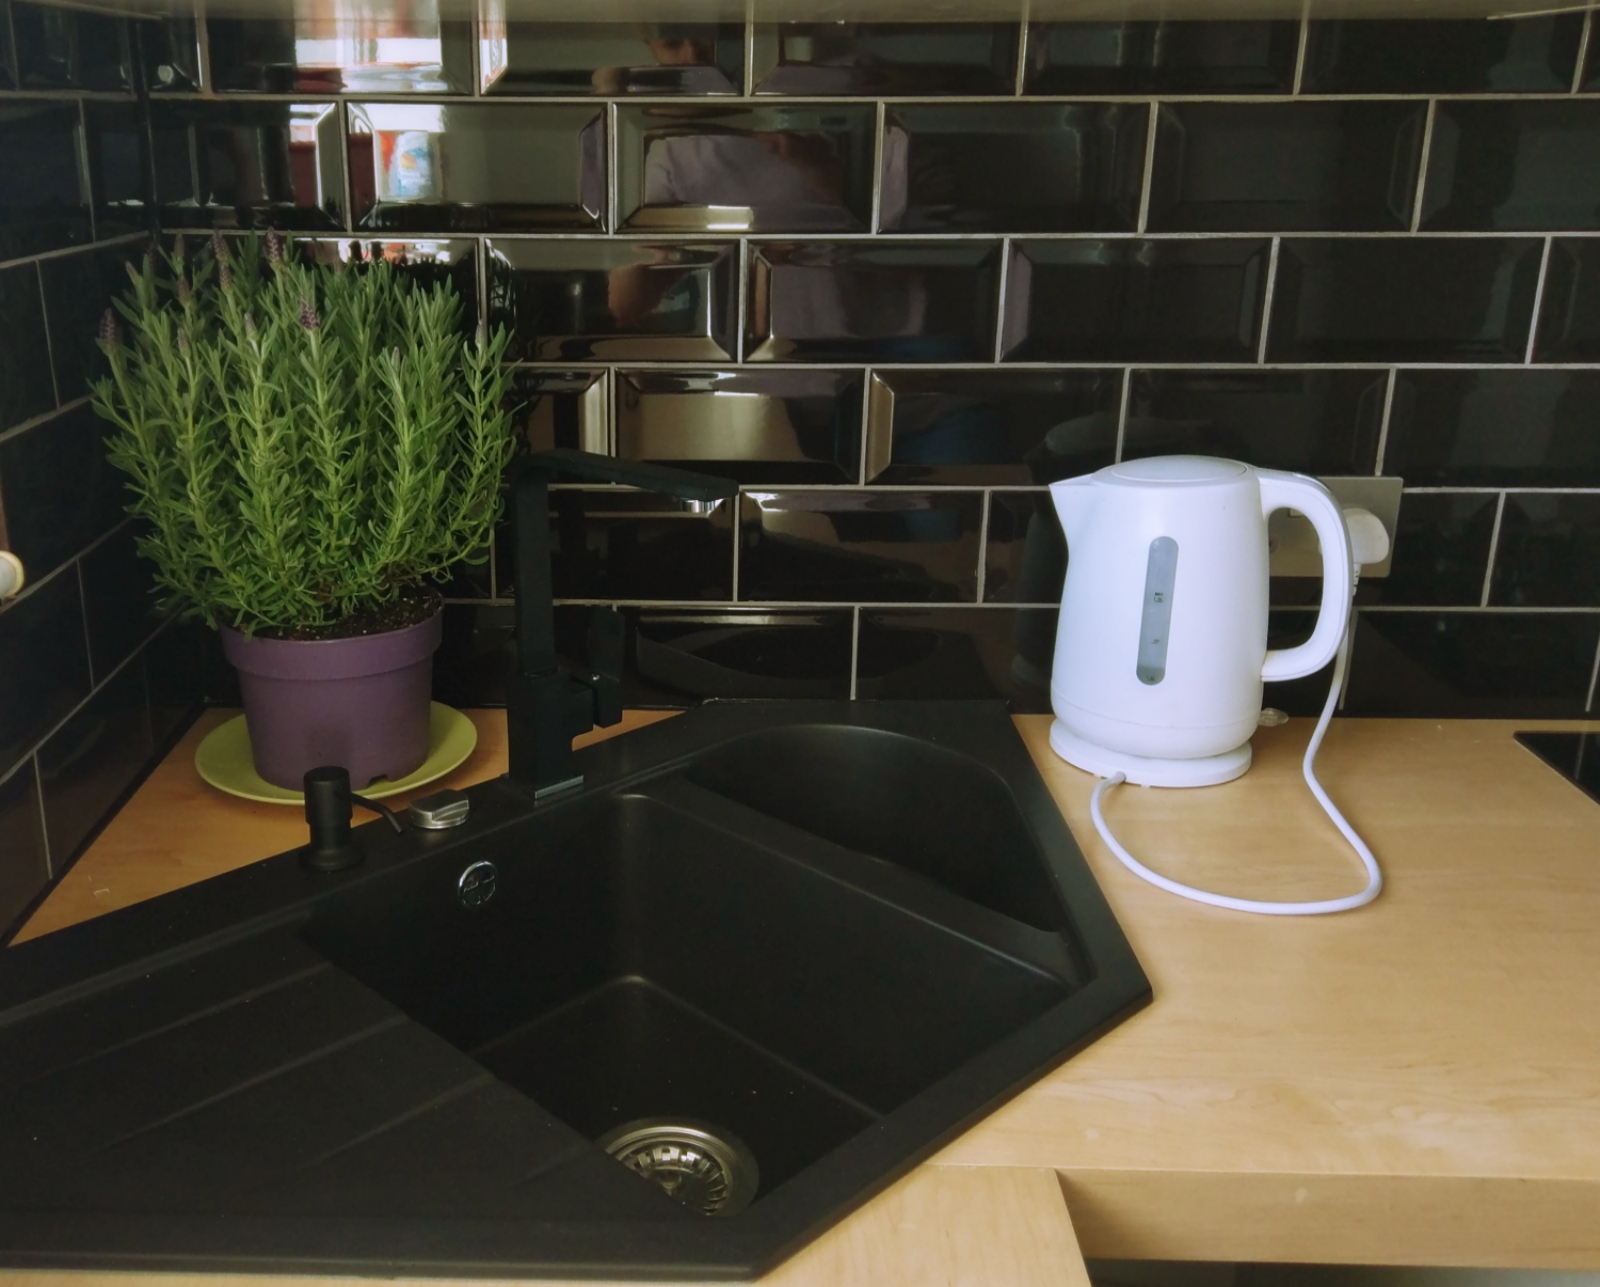 Richmond Kitchen tiling - fitting worktop and kitchen appliances